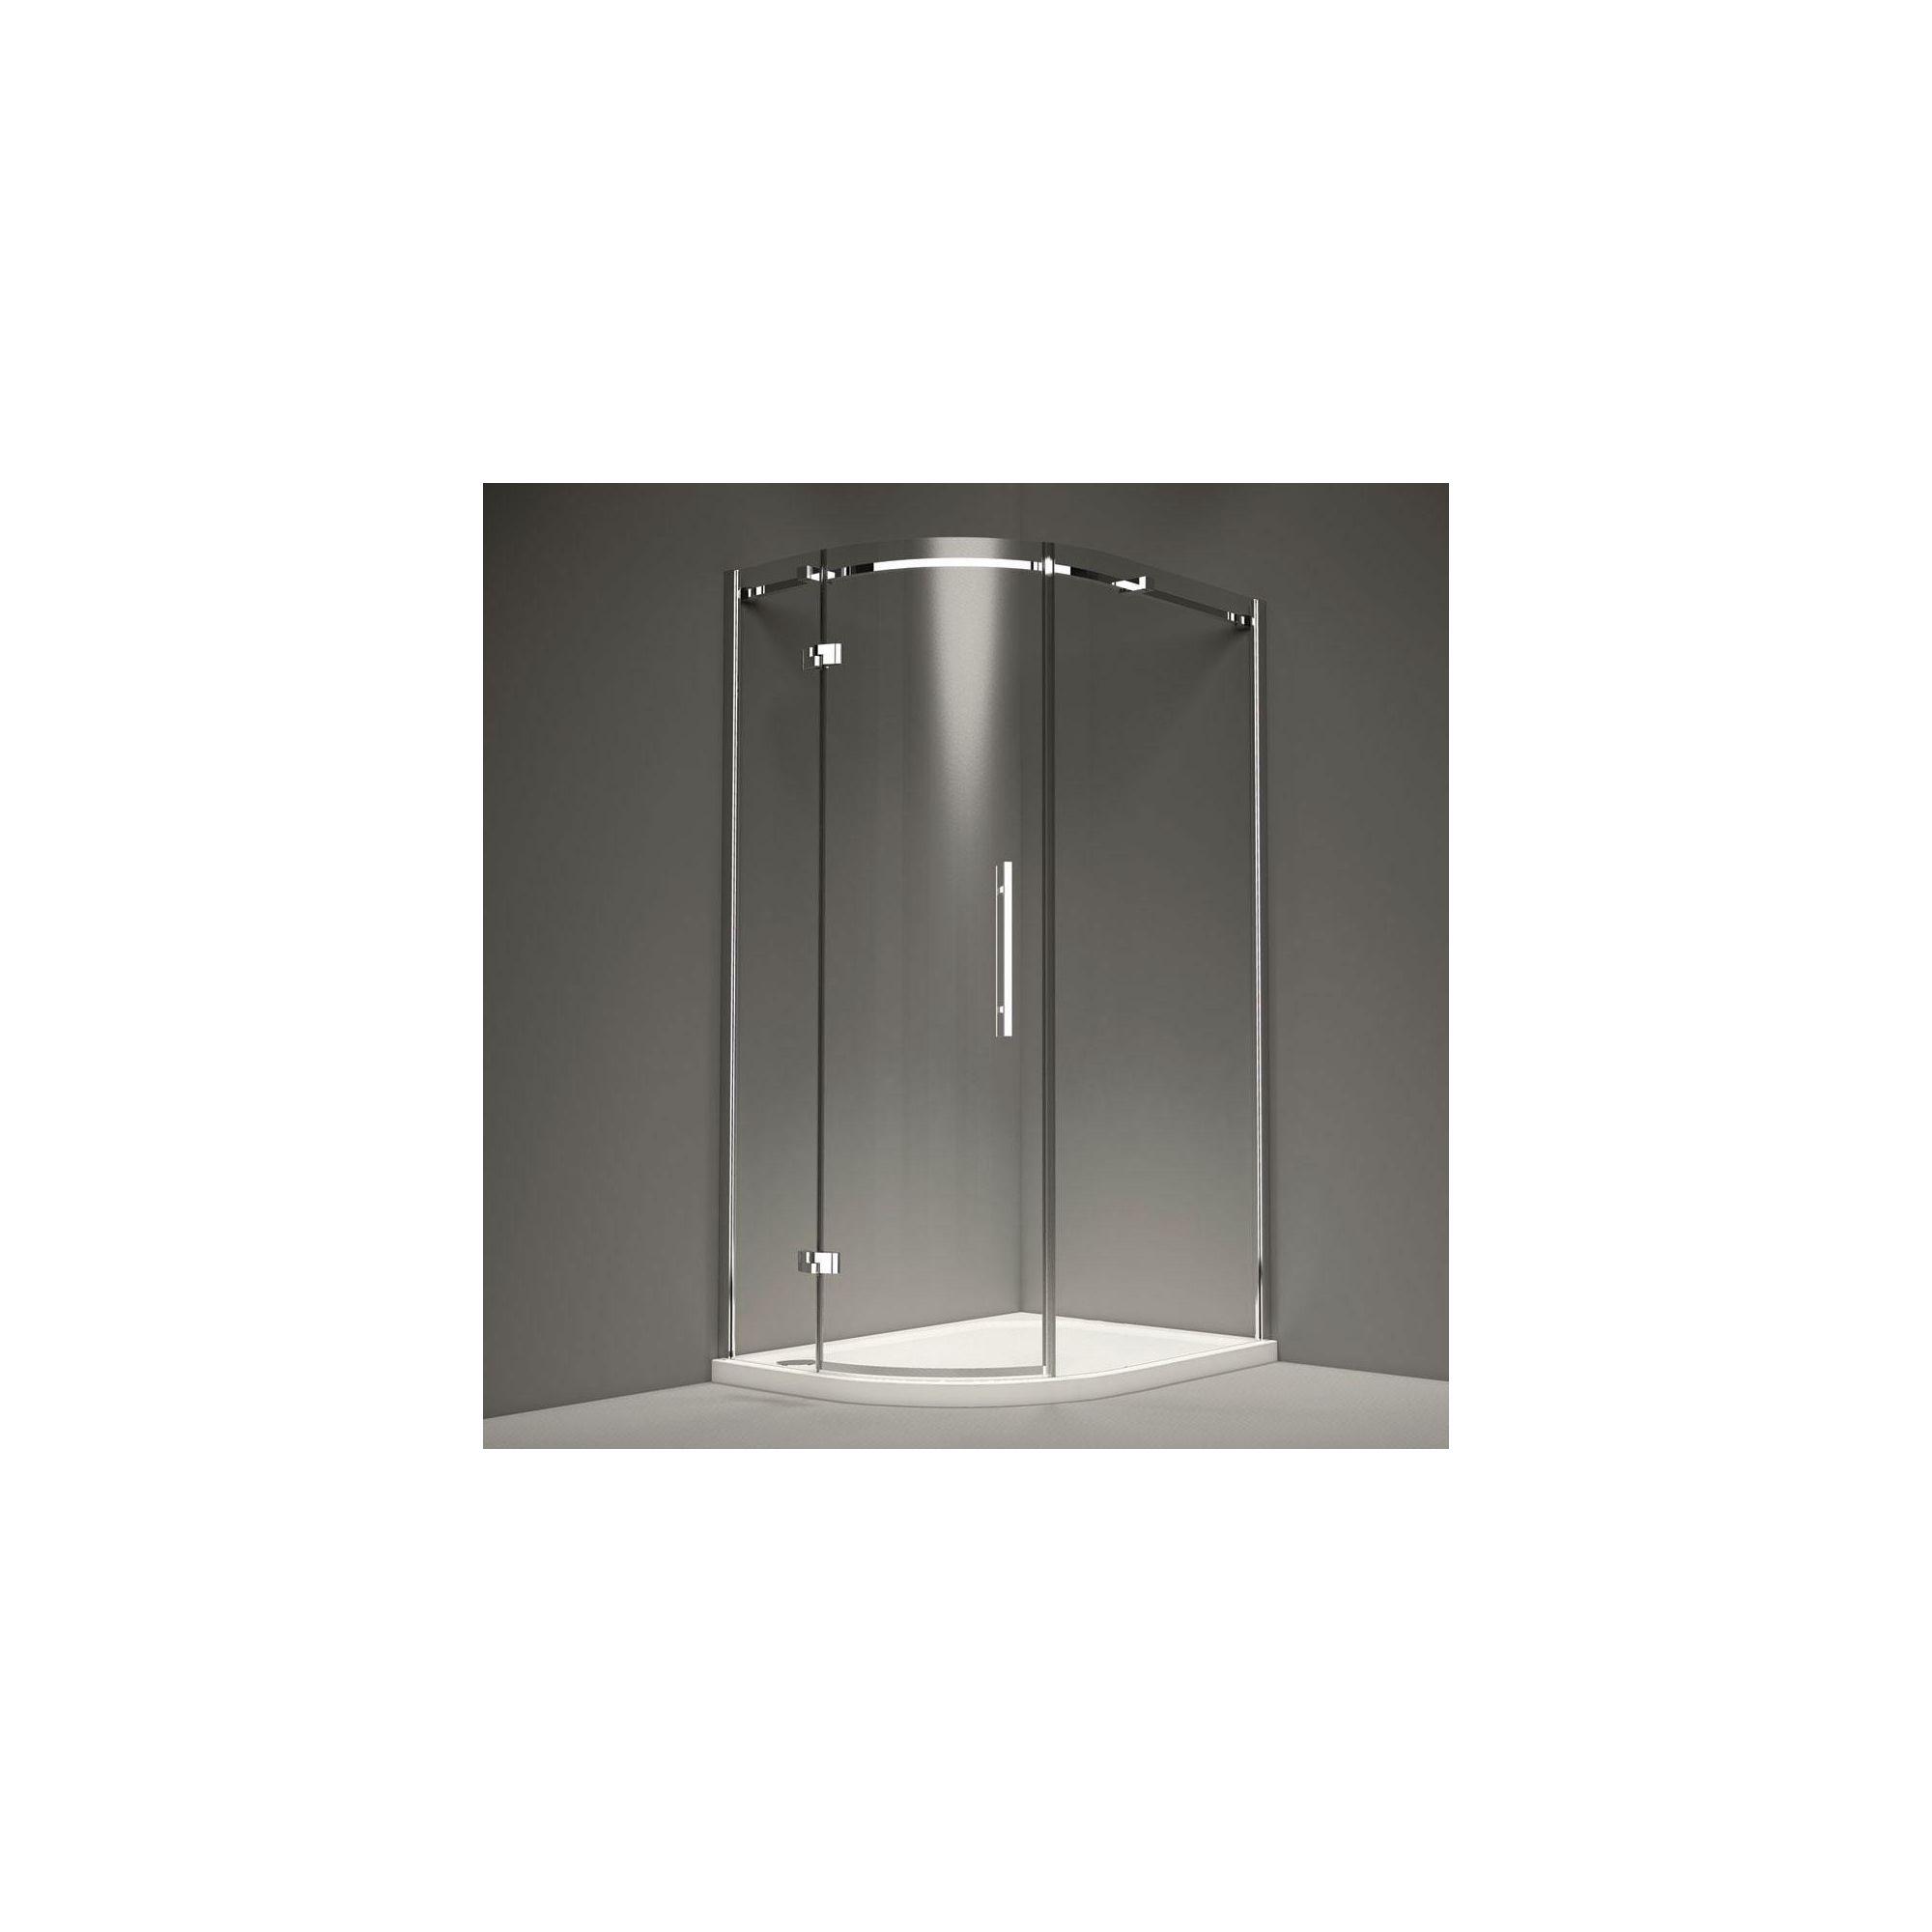 Merlyn Series 9 Single Quadrant Shower Door, 900mm x 900mm, 8mm Glass, Left Handed at Tesco Direct